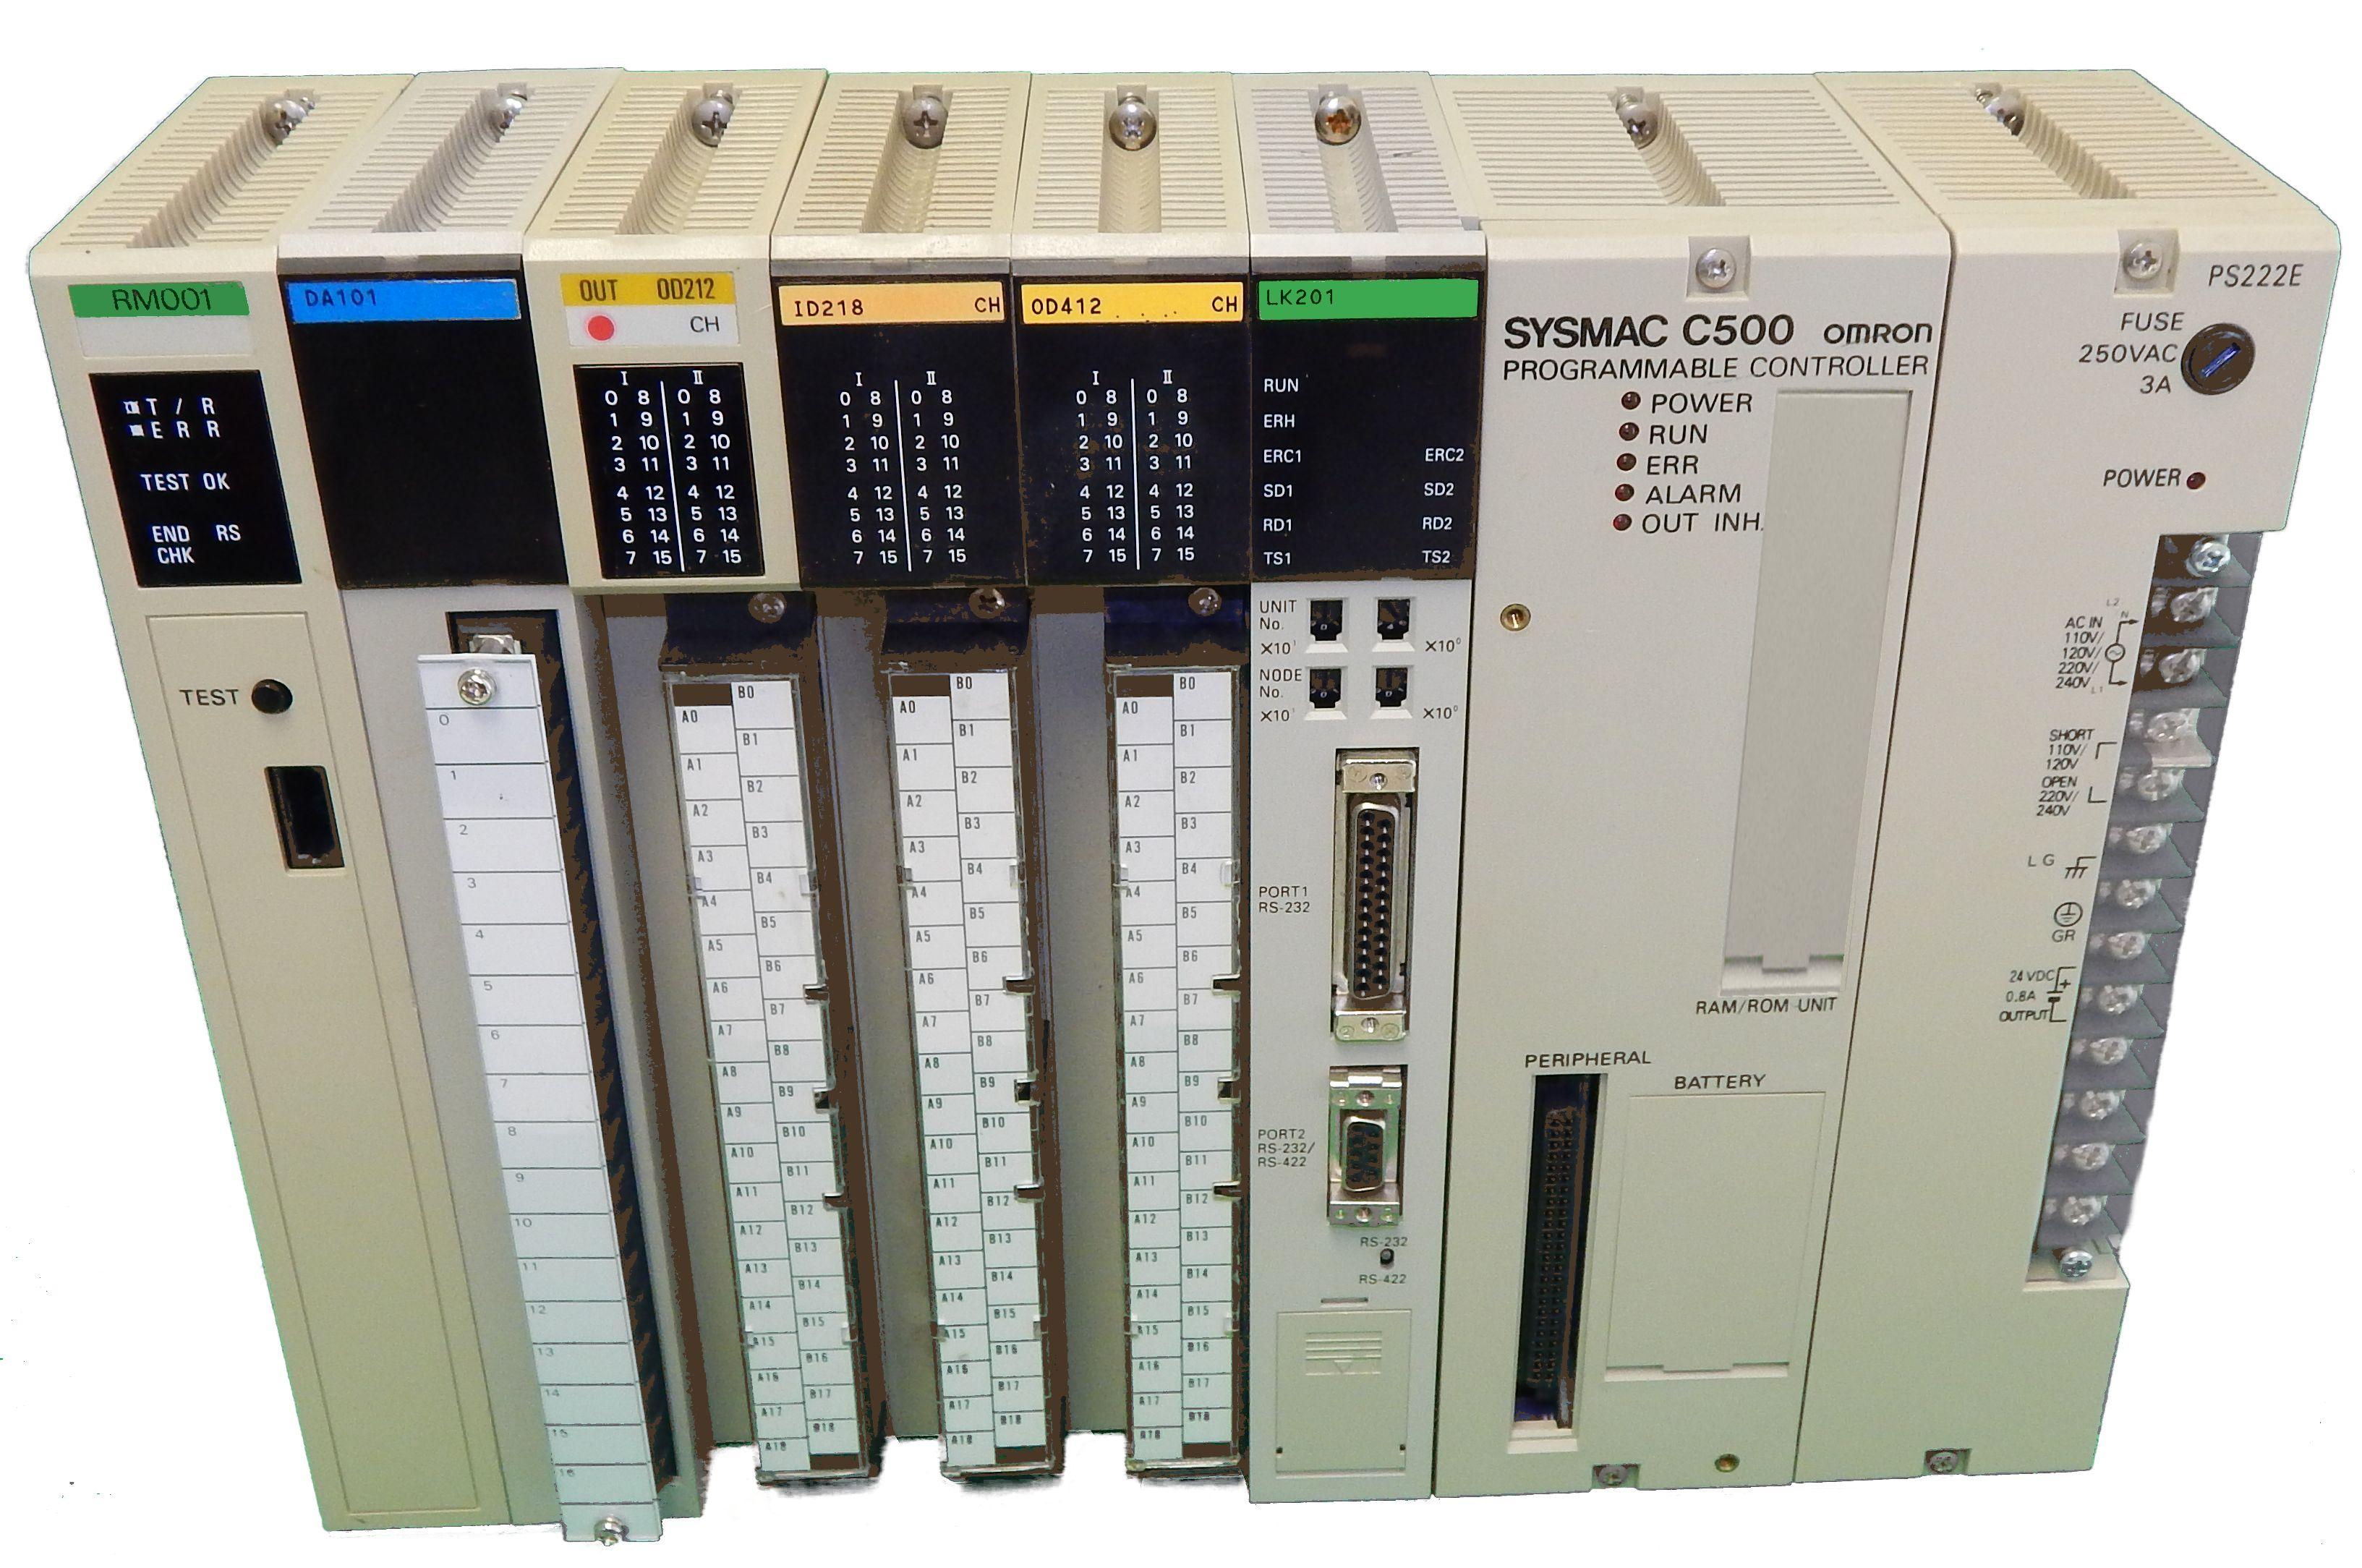 3G2C7-CPU34-E